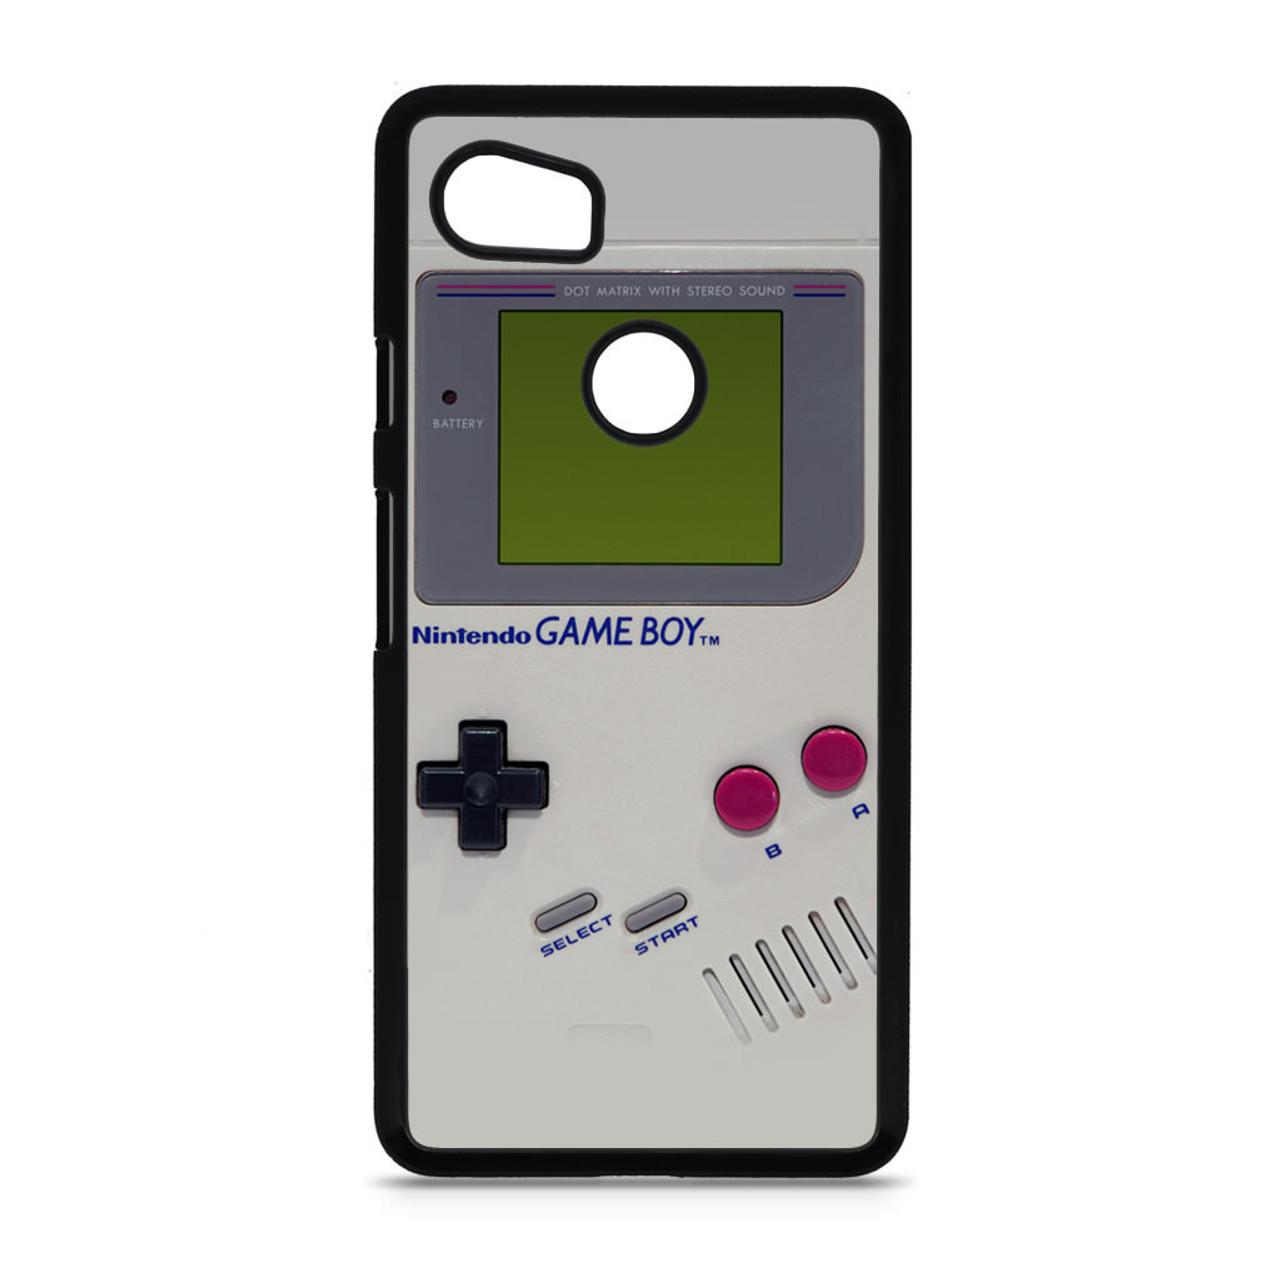 Retro Gameboy Nintendo Google Pixel 2 Xl Case Caseshunter